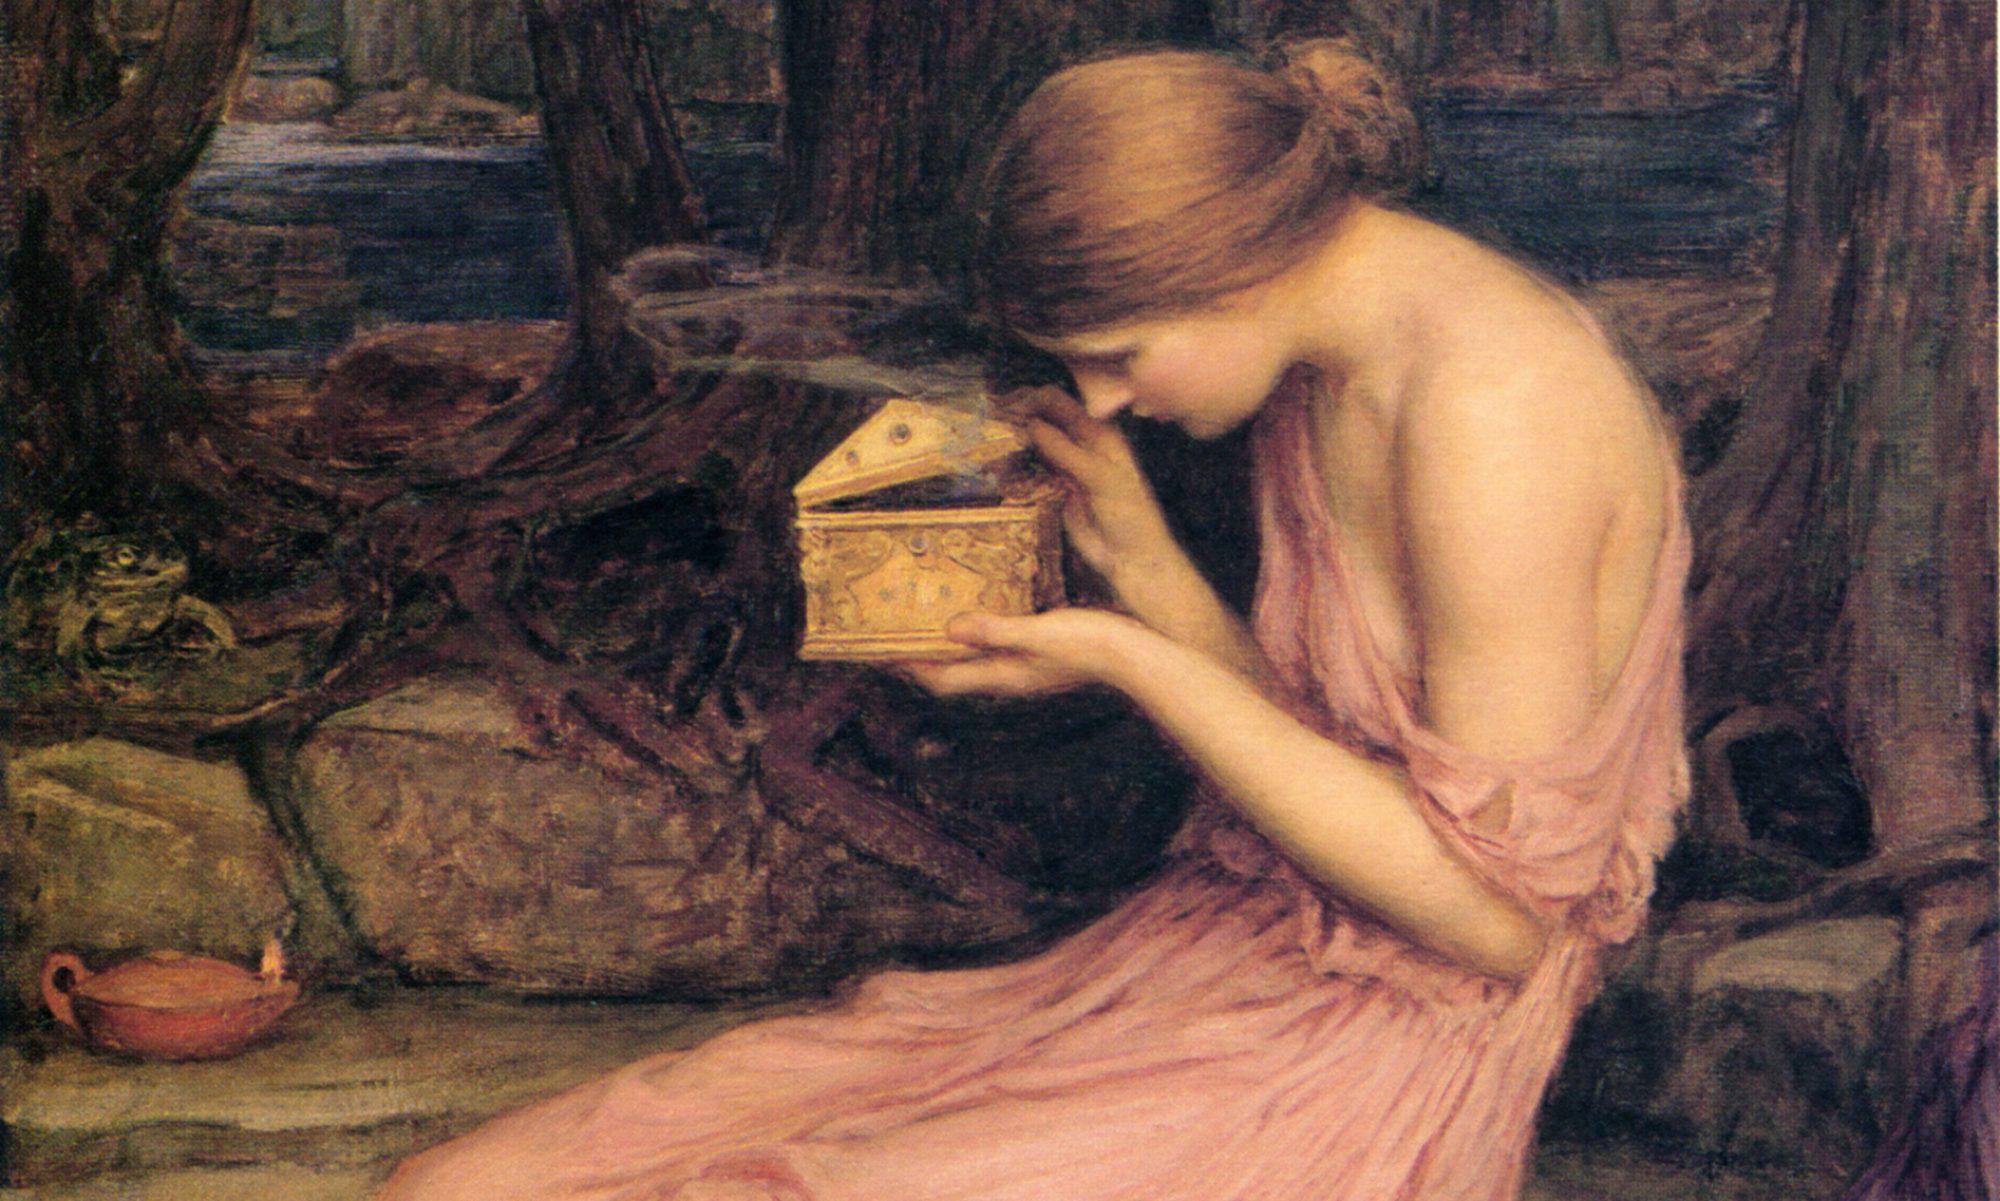 Il Vaso di Pandora Onlus